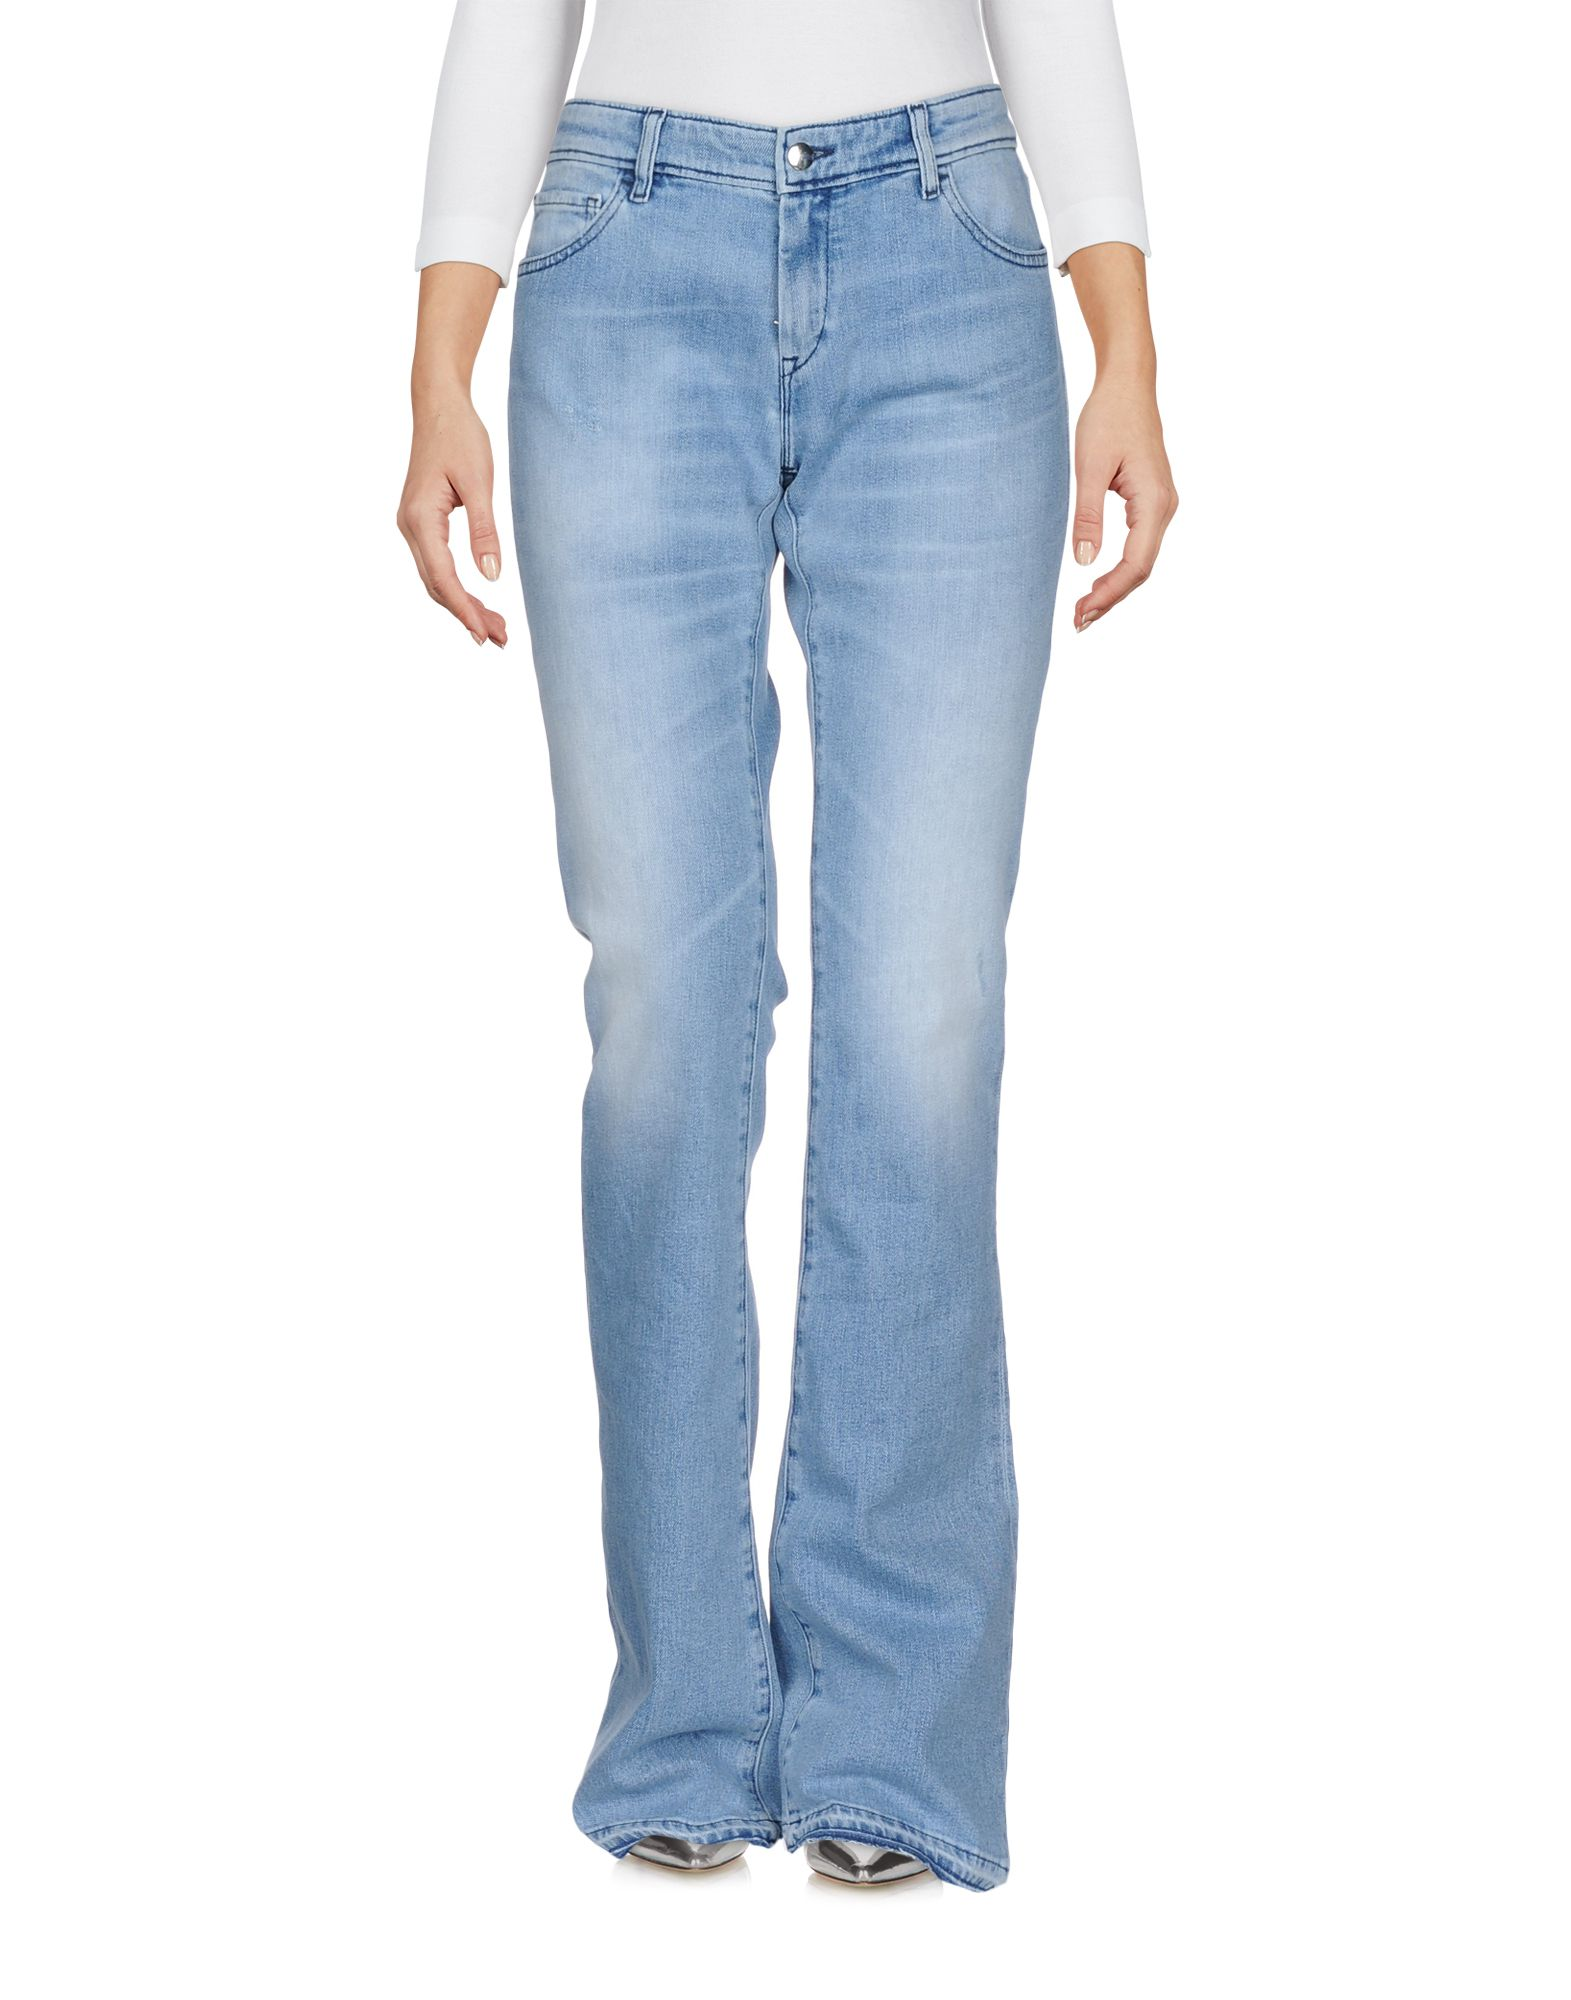 Pantaloni Jeans The Seafarer Donna - Acquista online su 2rjuybd